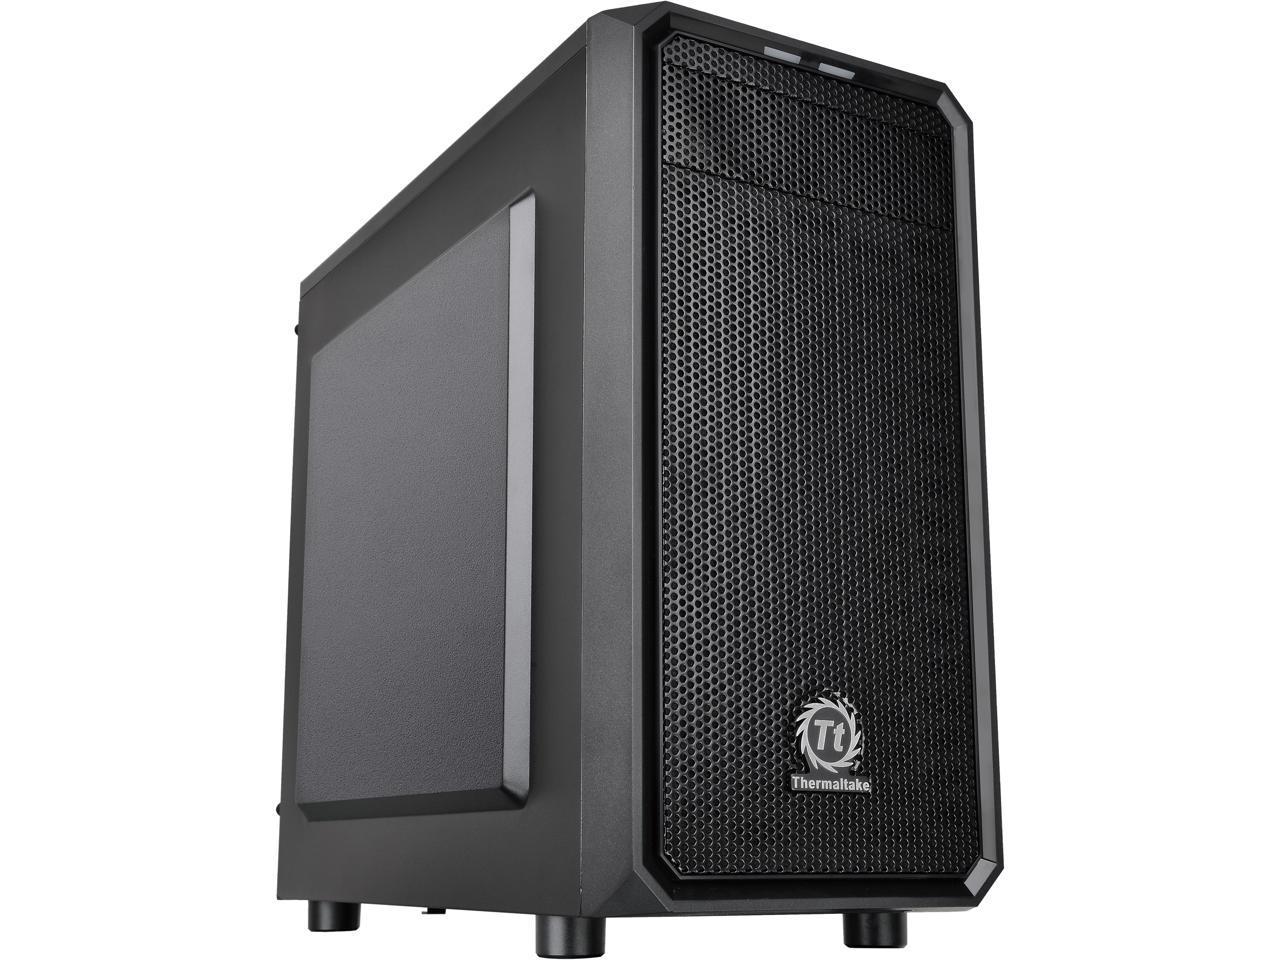 Thermaltake Versa H15 SPCC Micro ATX Tower Computer Case